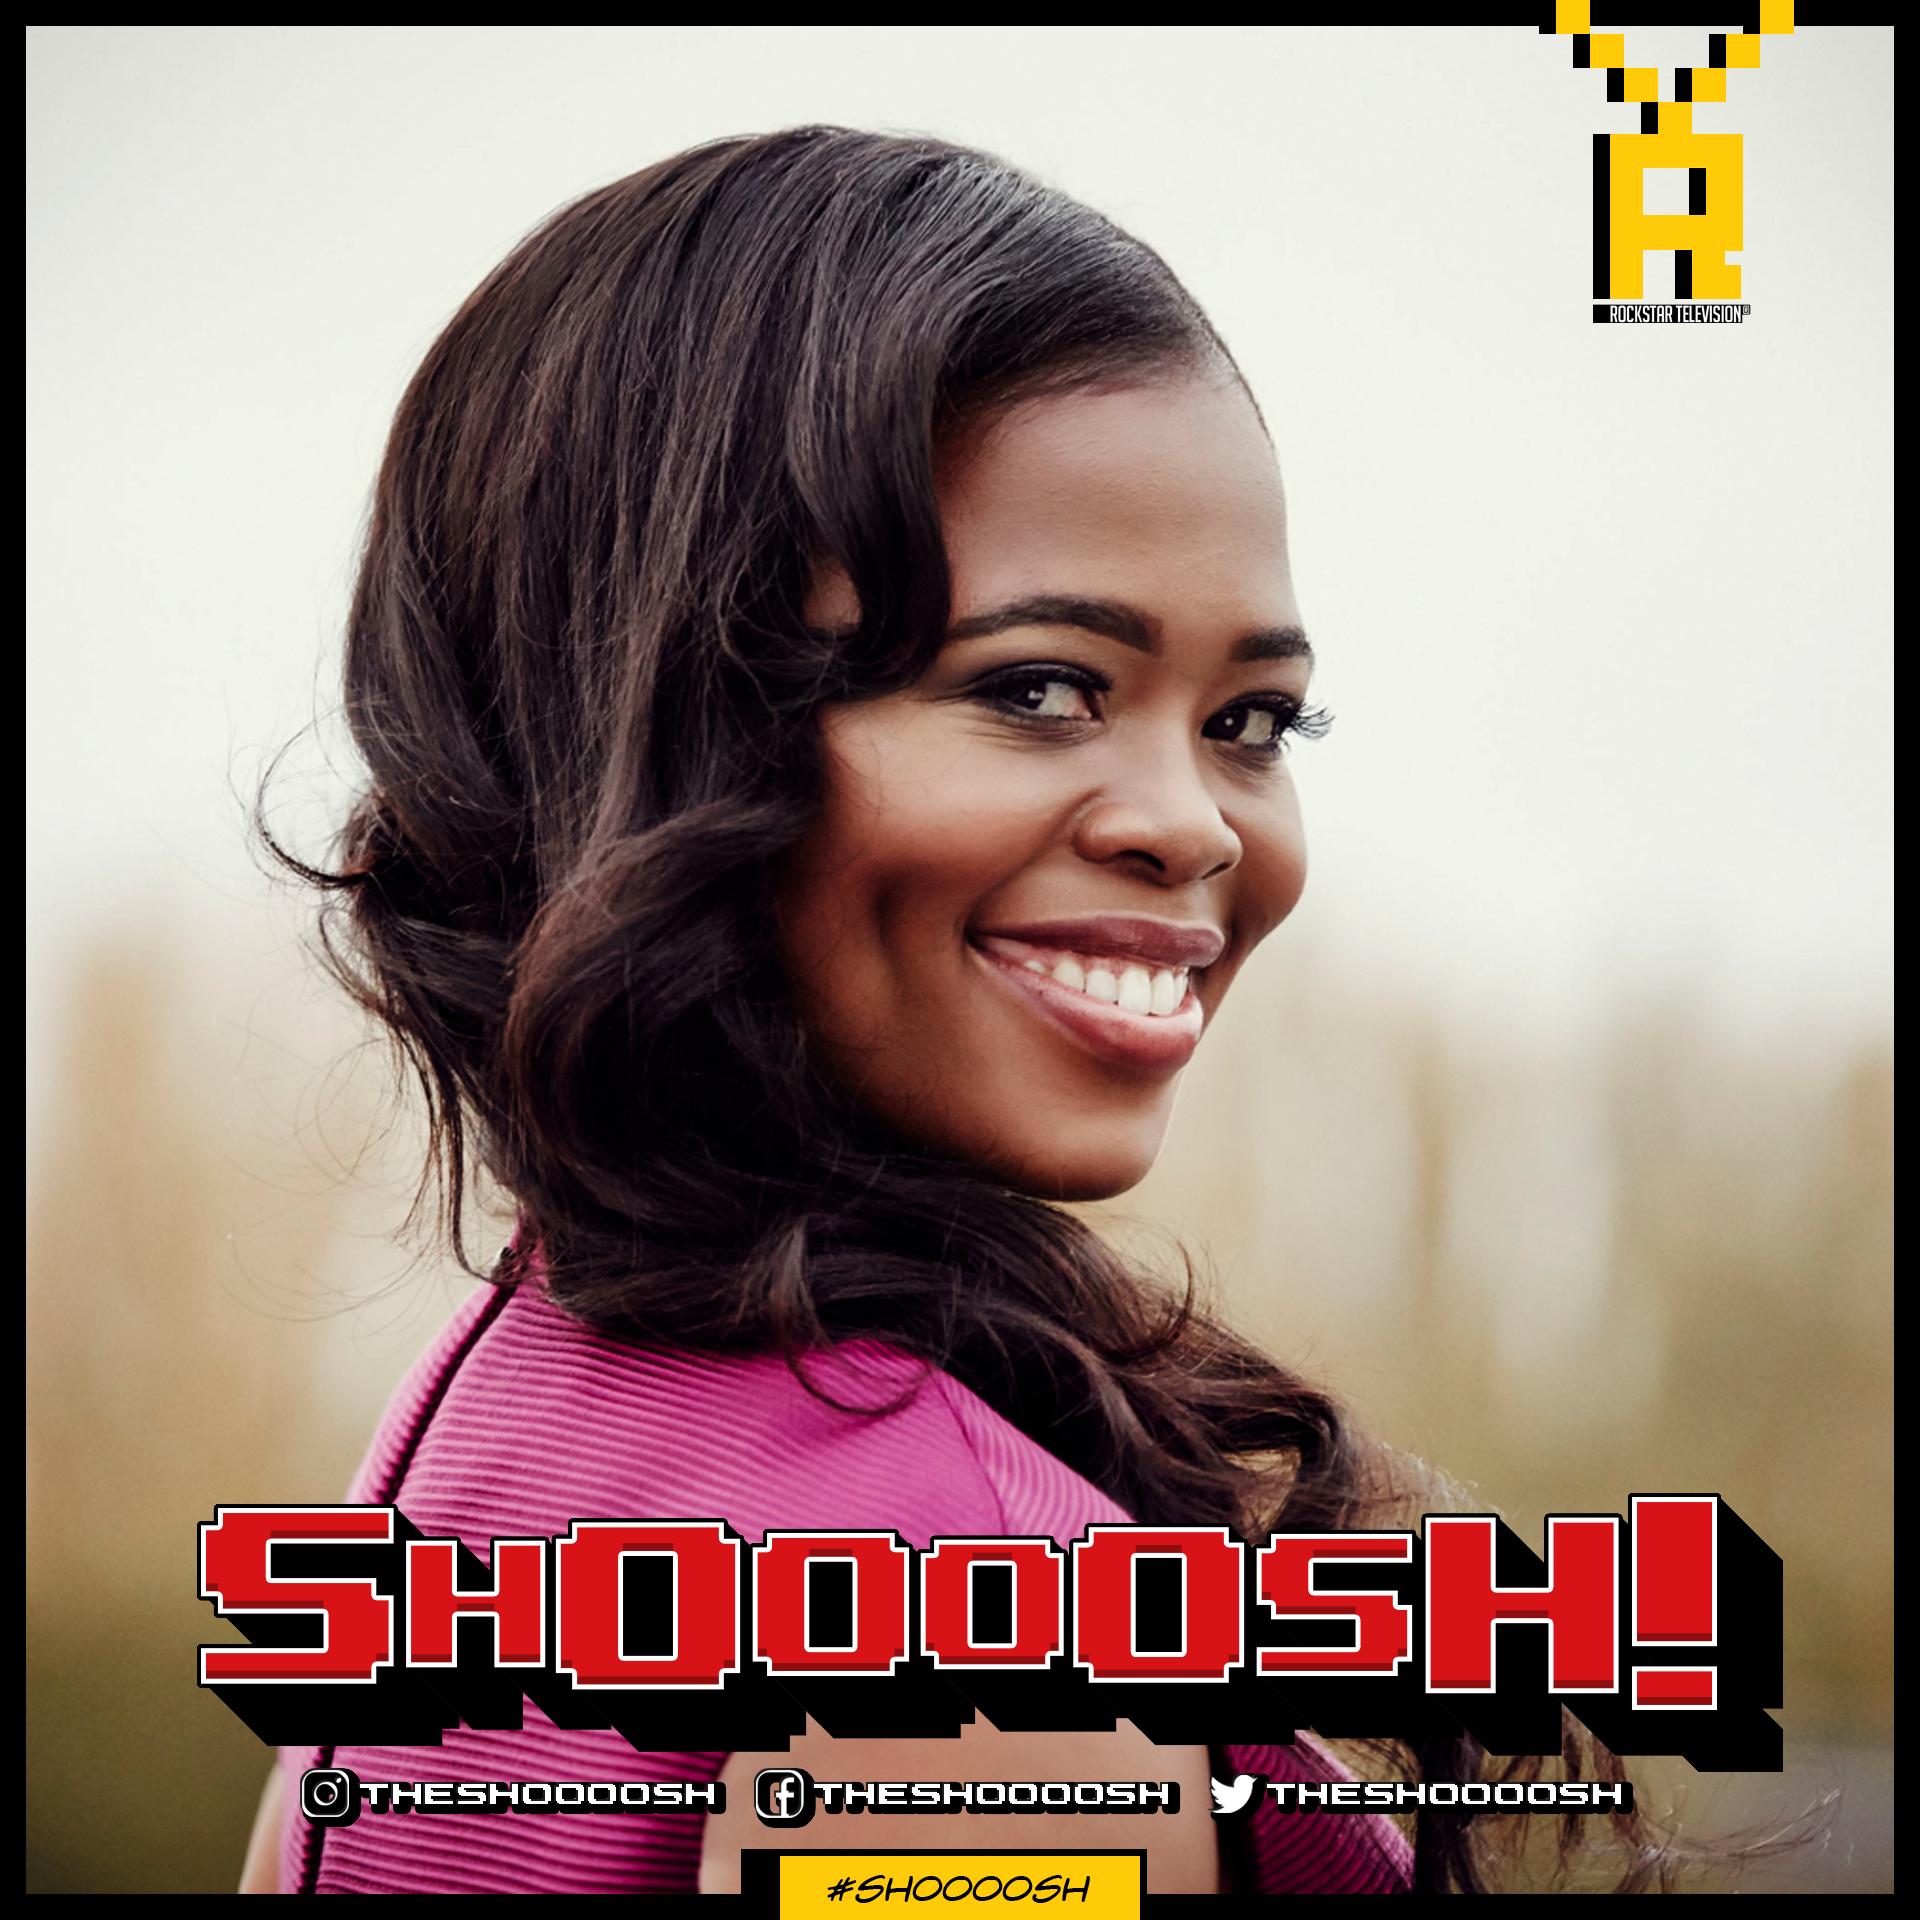 shoooosh-pretty-yende00001